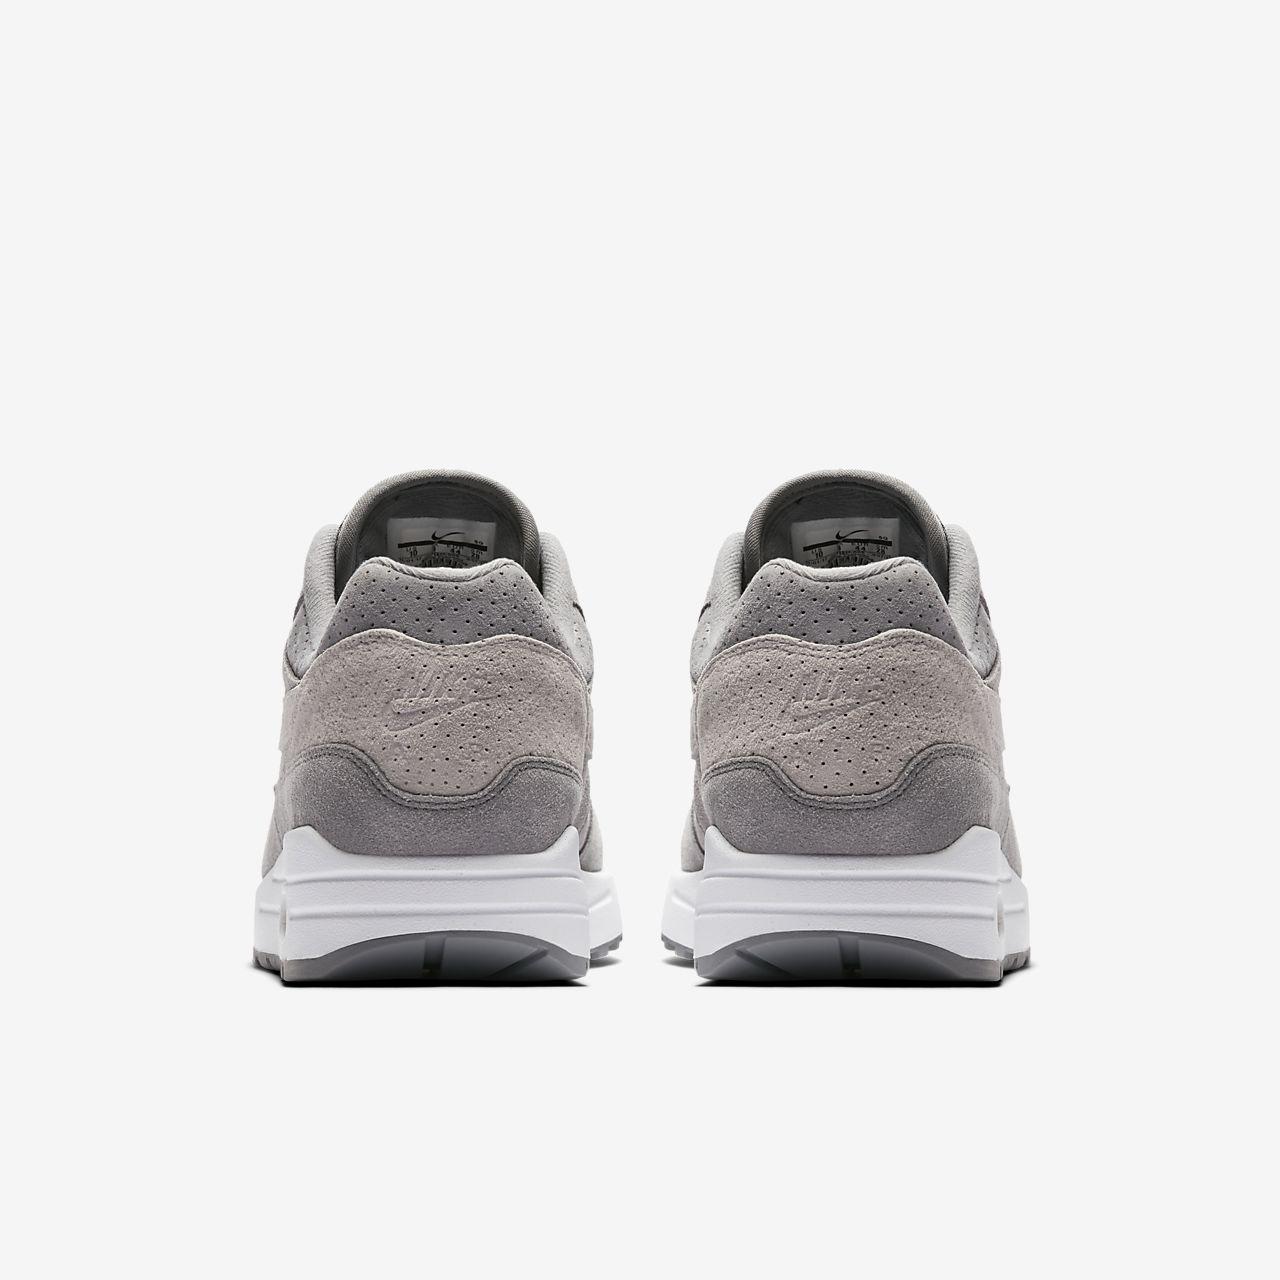 ... Nike Air Max 1 Premium Herenschoen